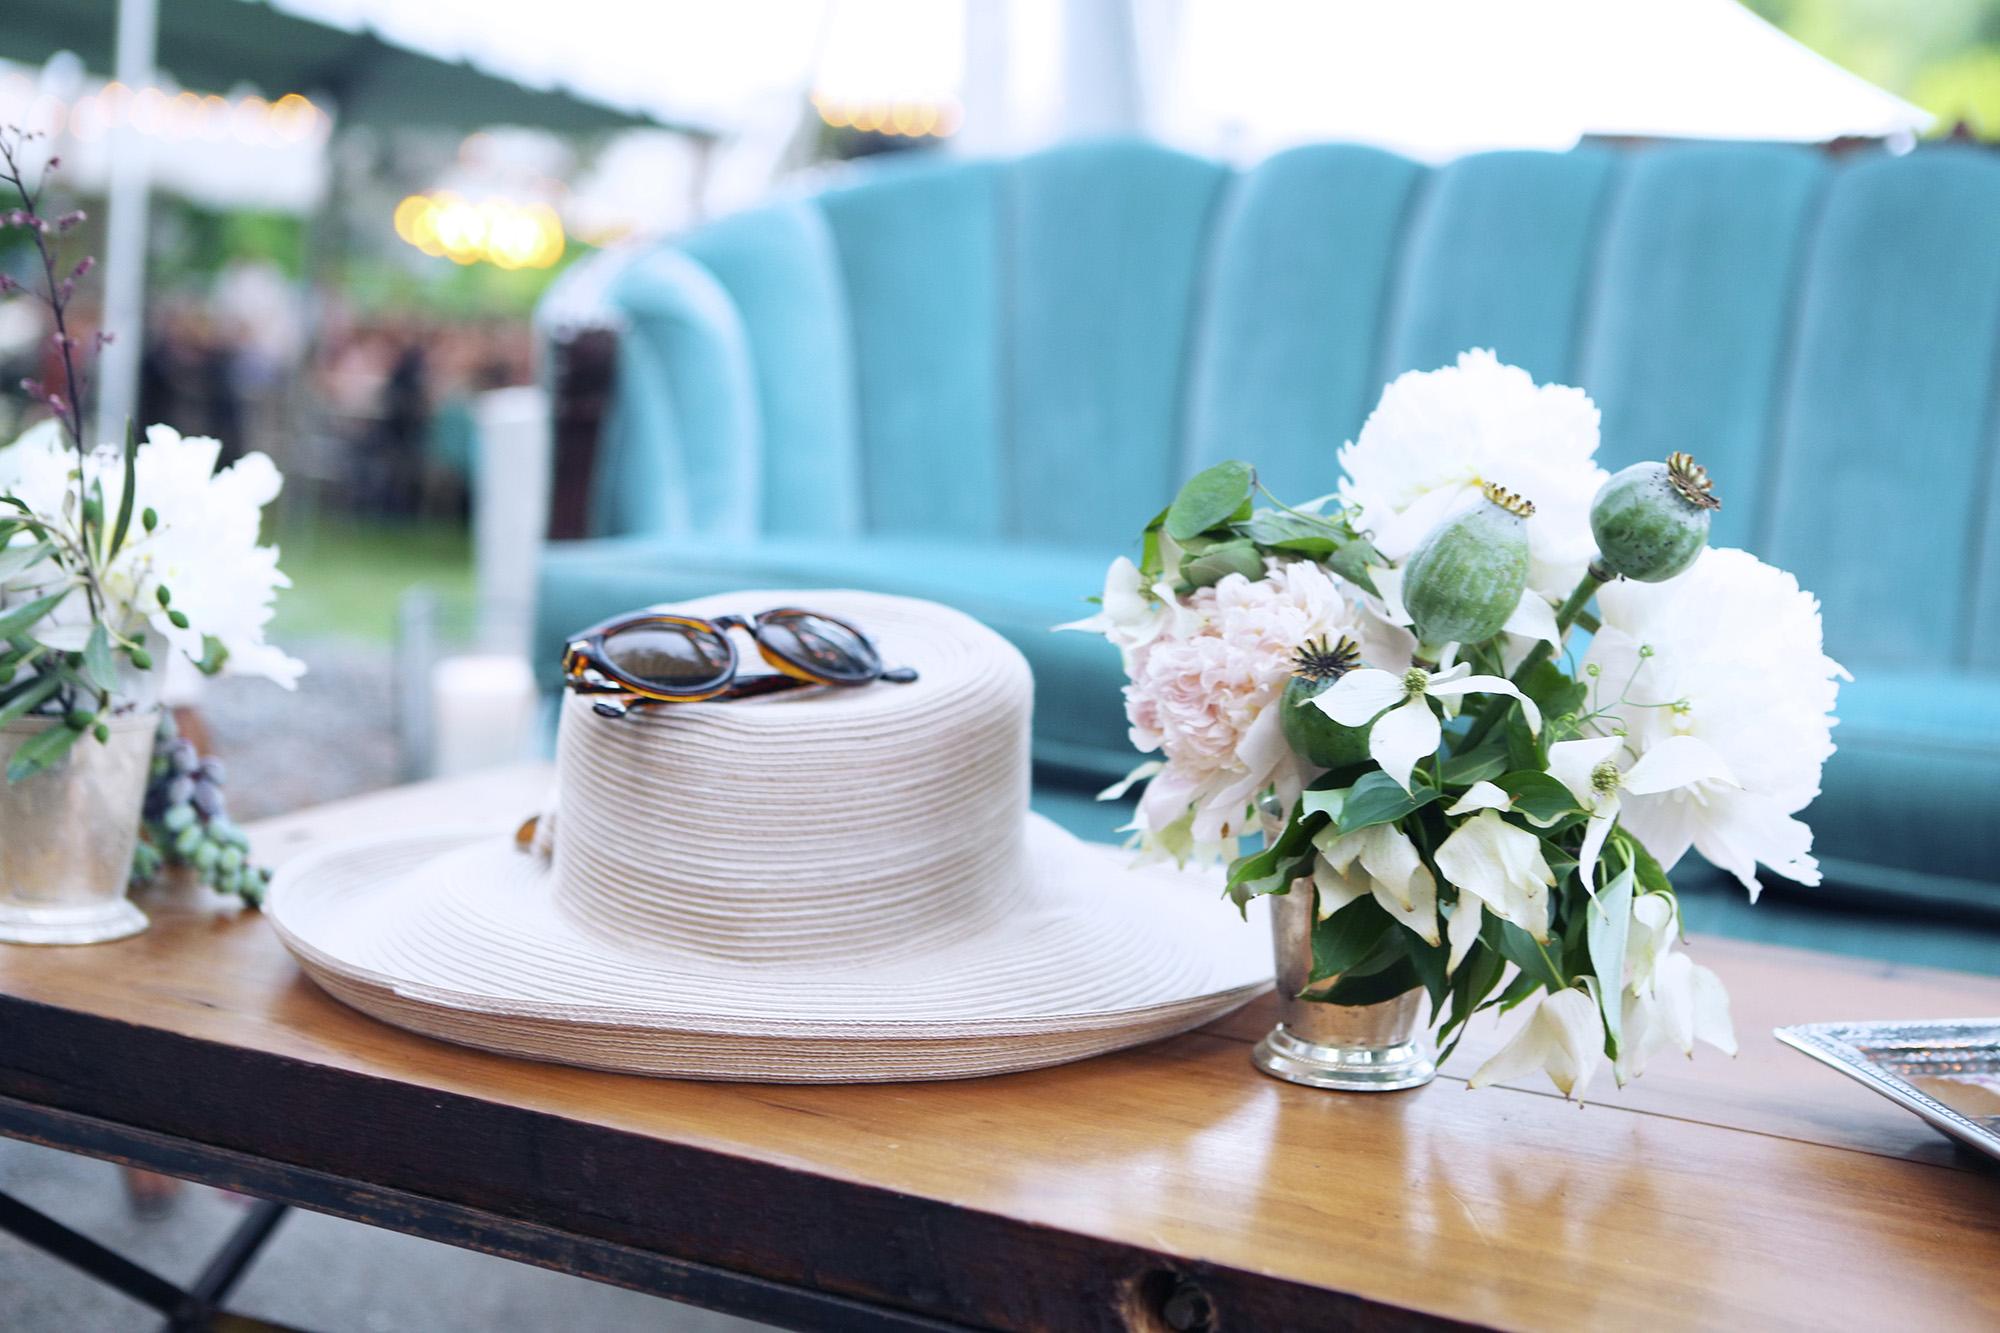 Shannon-Wellington-Delaware-Wedding-Rustic-Home-Wedding08.jpg